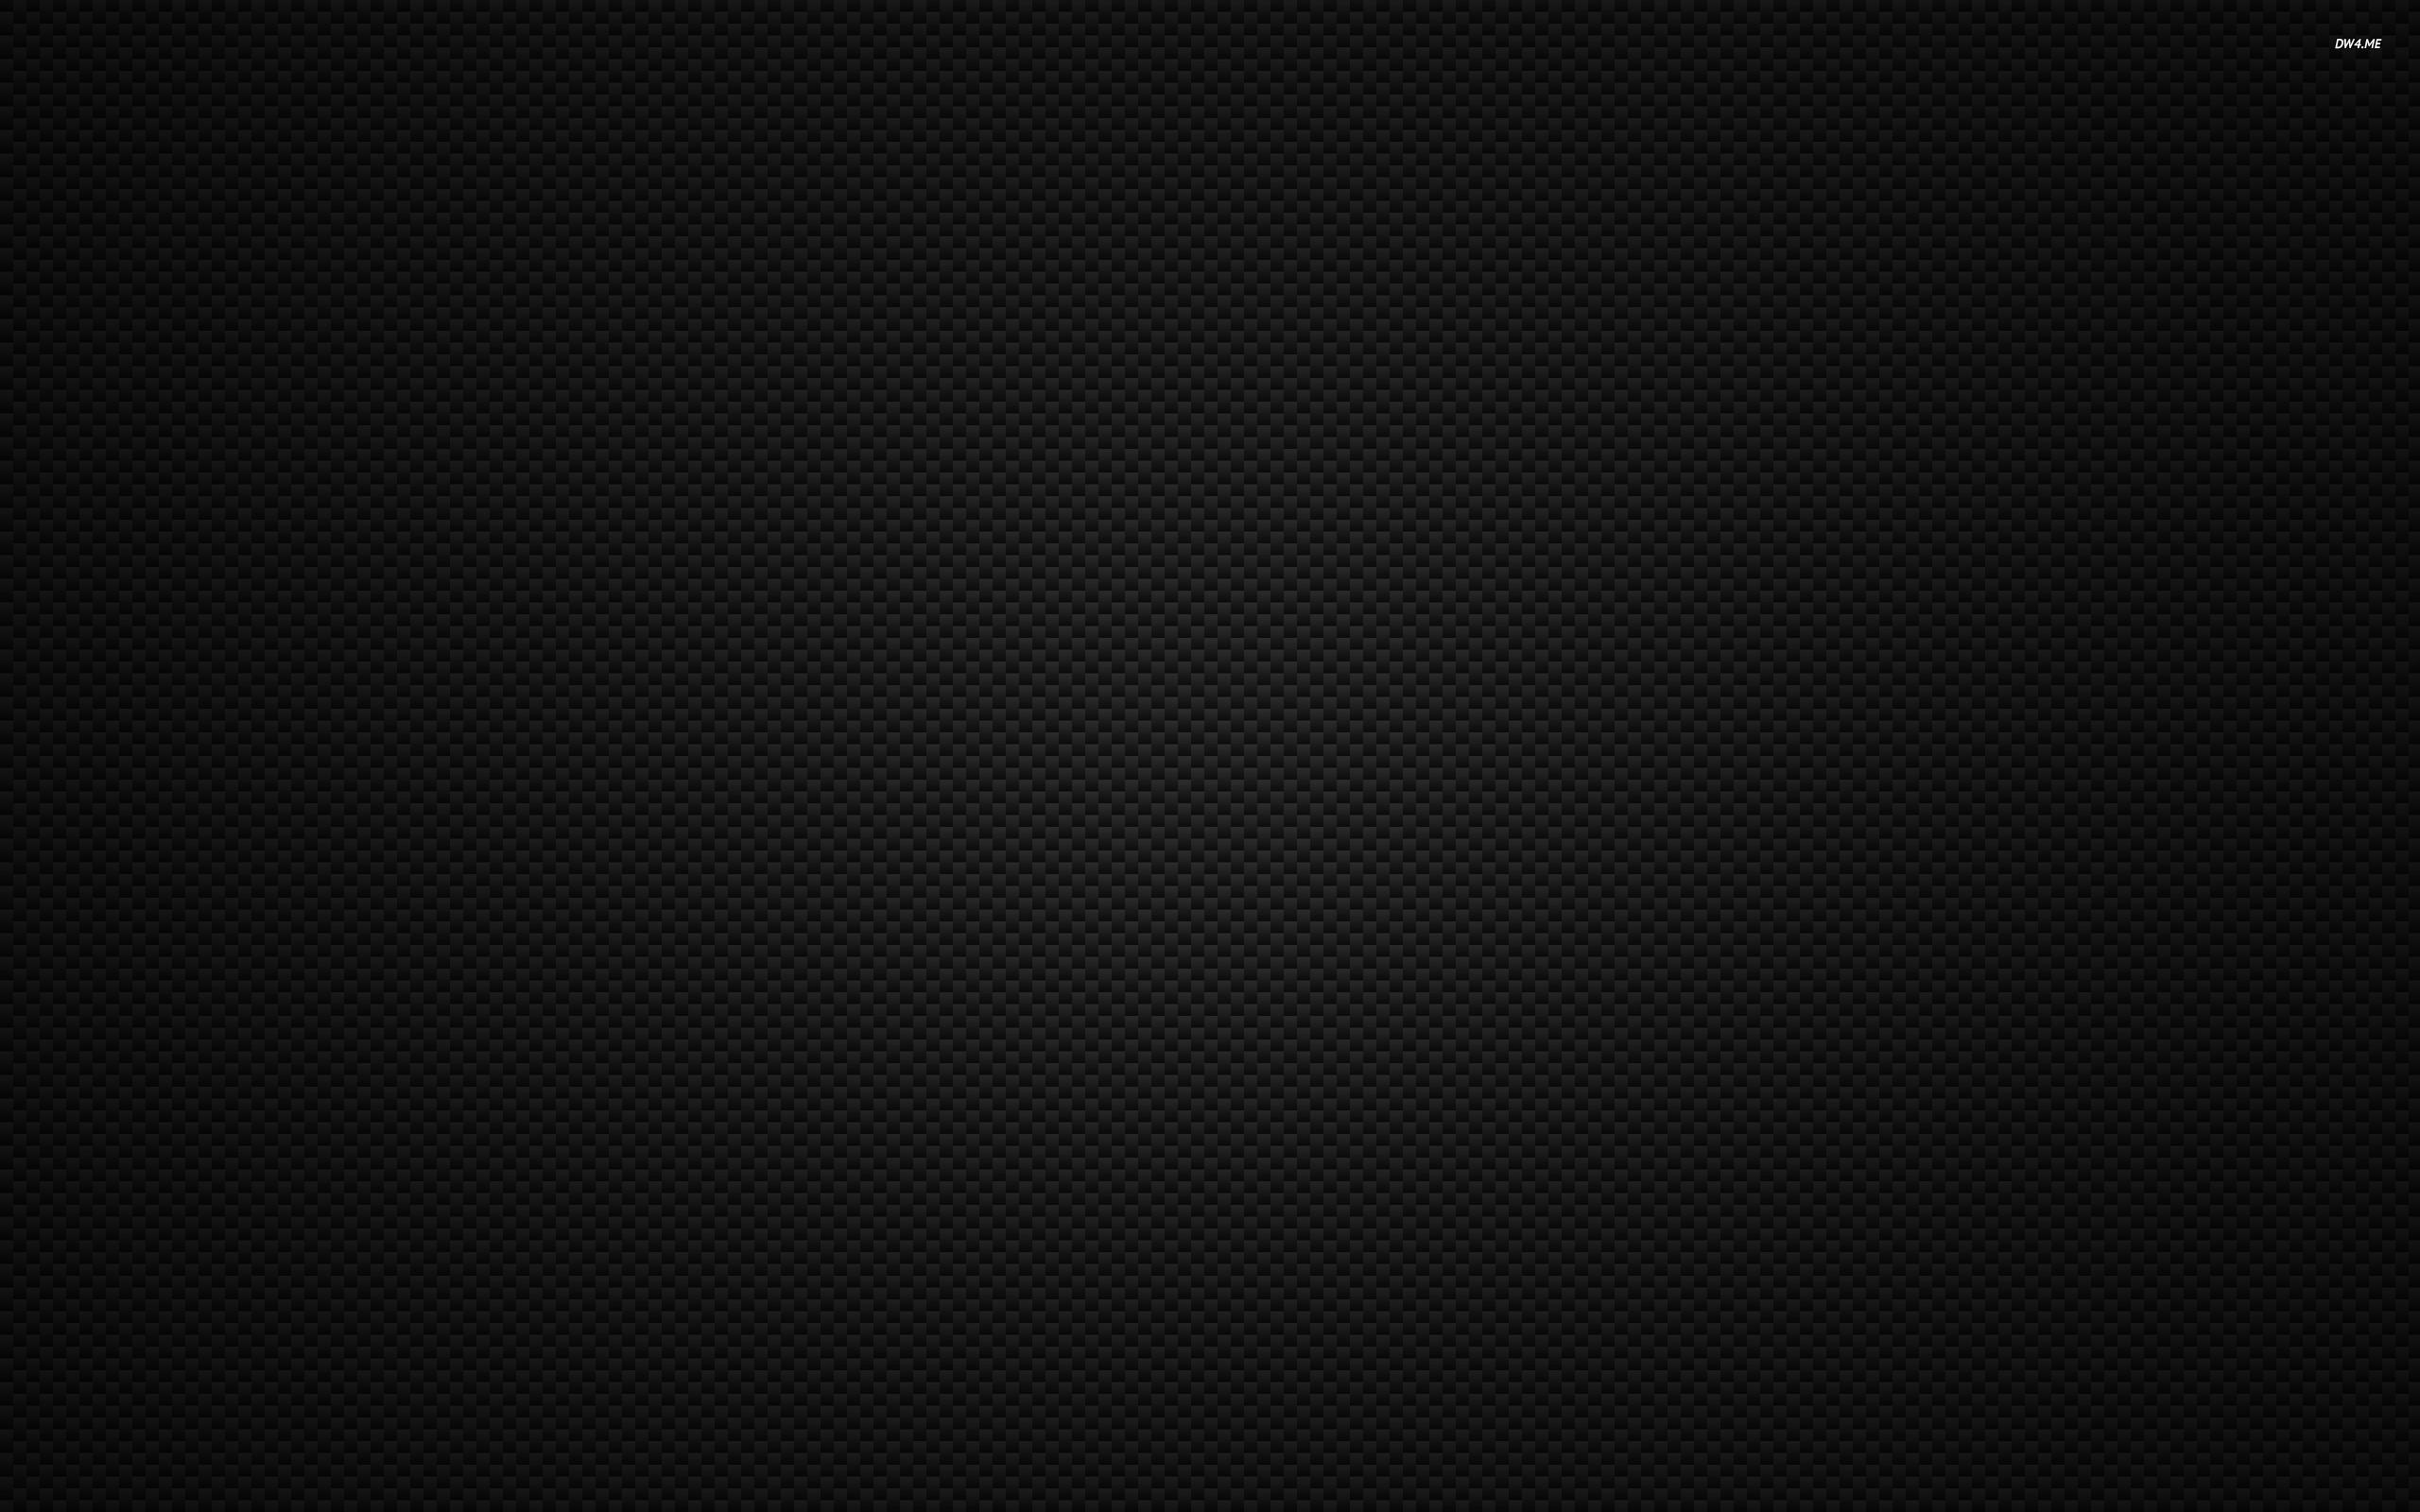 Carbon Fiber Pattern wallpapers HD   382209 2560x1600